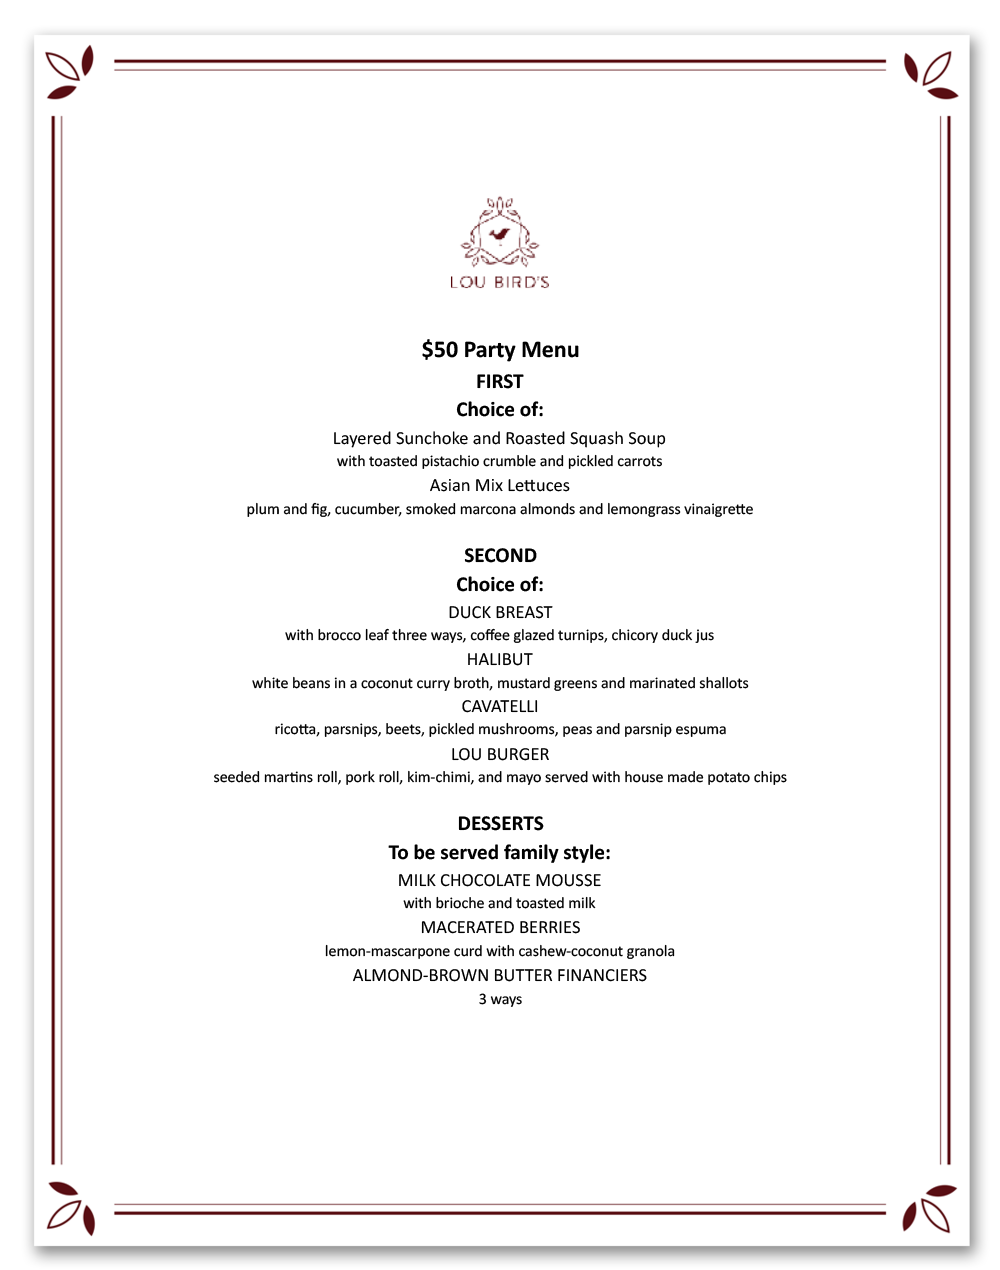 $50 PARTY MENU. Click to download menu